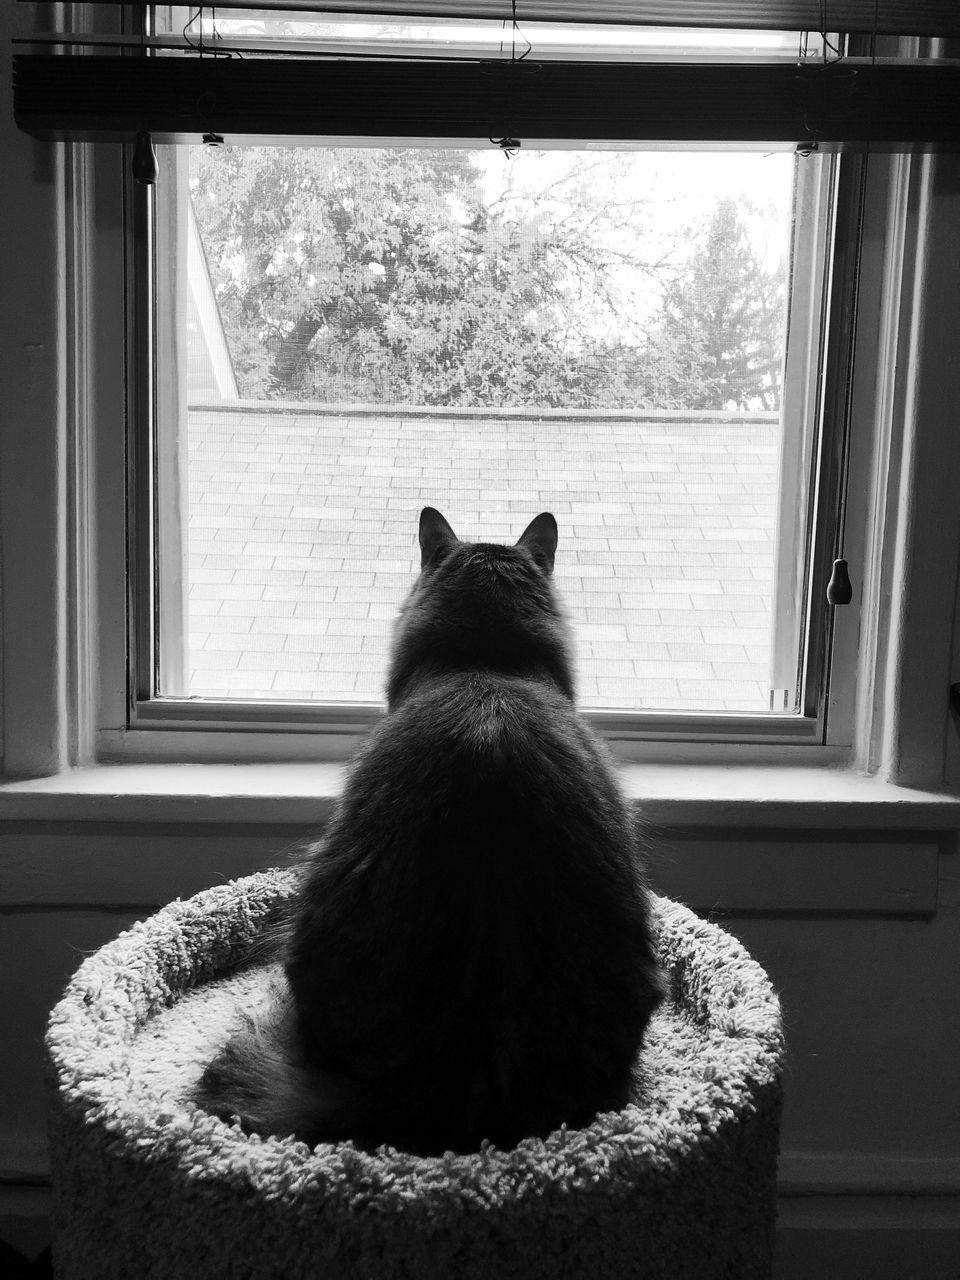 REAR VIEW OF CAT SITTING ON WINDOW